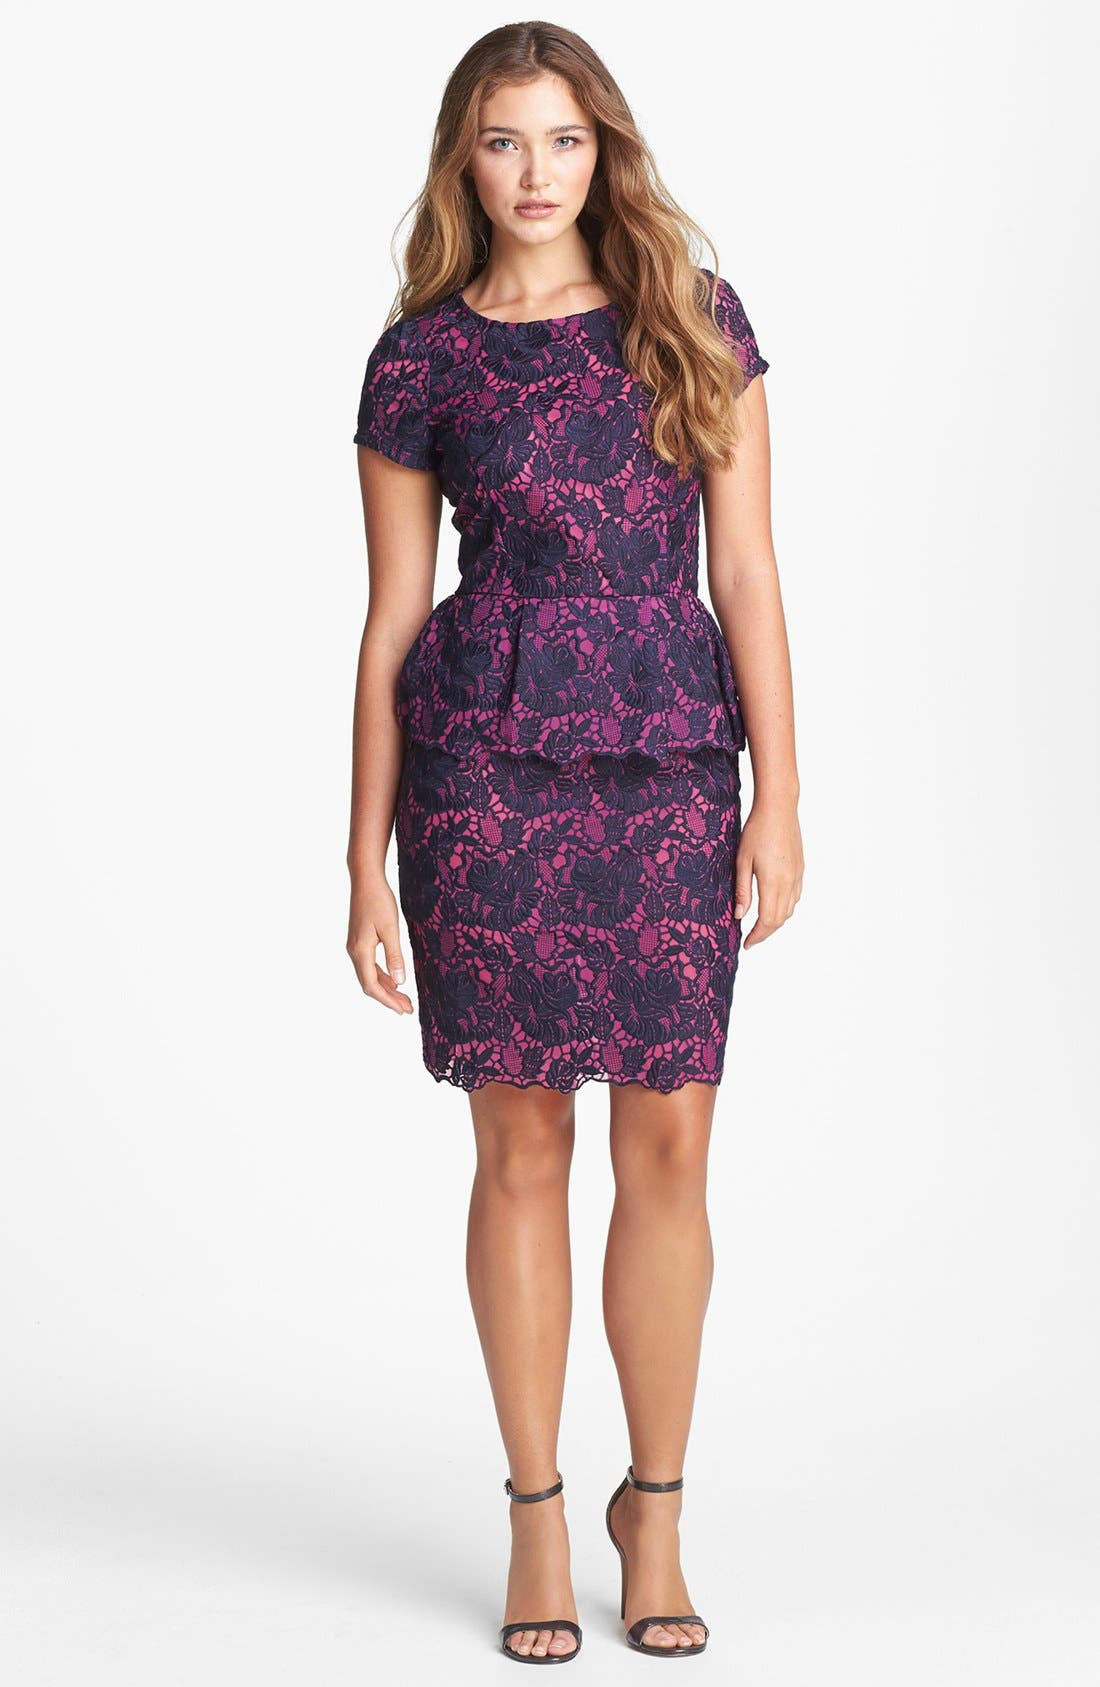 Main Image - Felicity & Coco Lace Peplum Sheath Dress (Regular & Petite) (Nordstrom Exclusive)